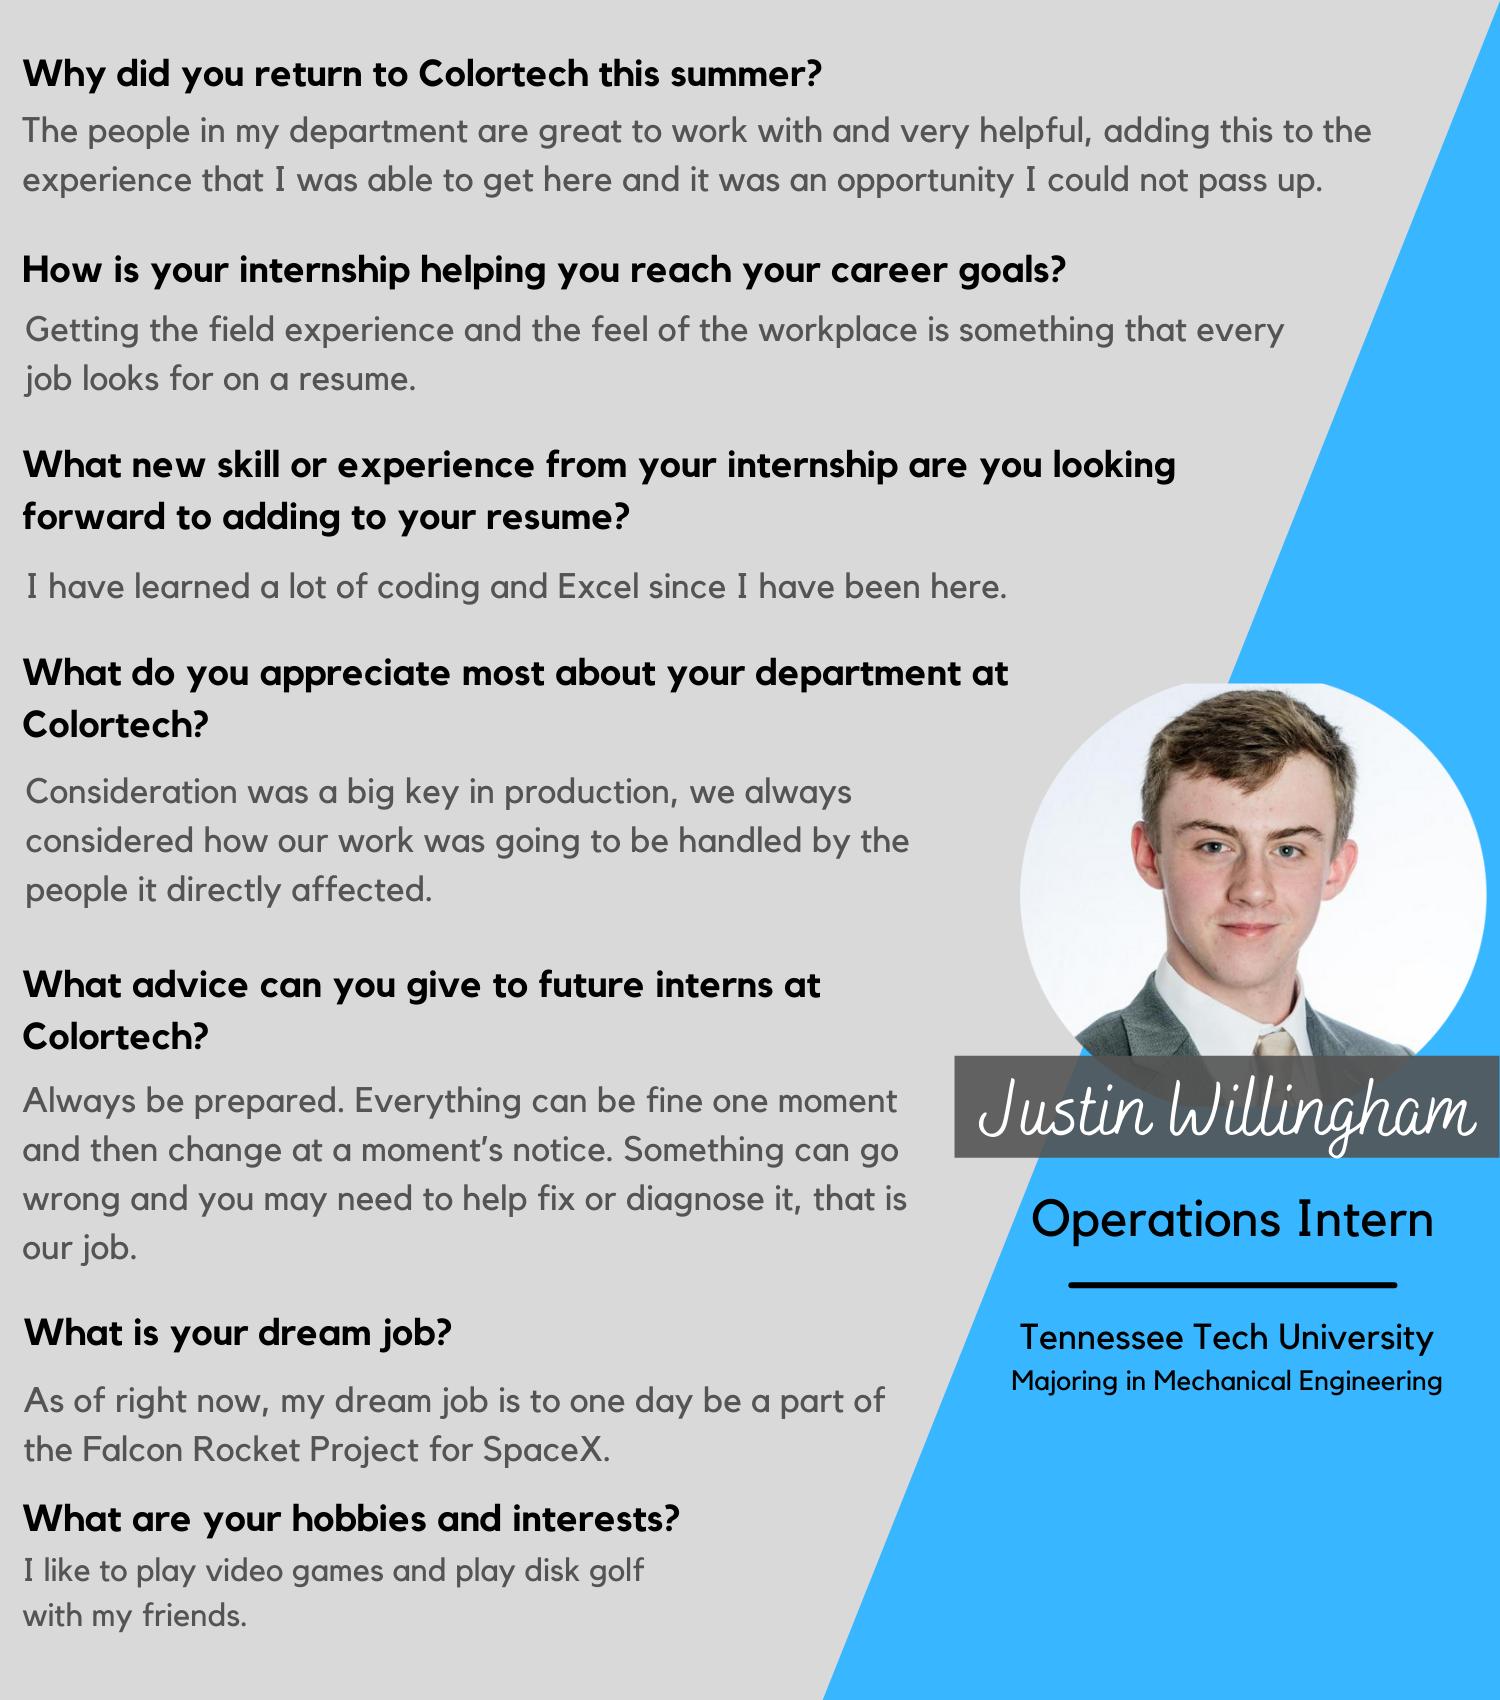 Justin Willingham, Operations Intern